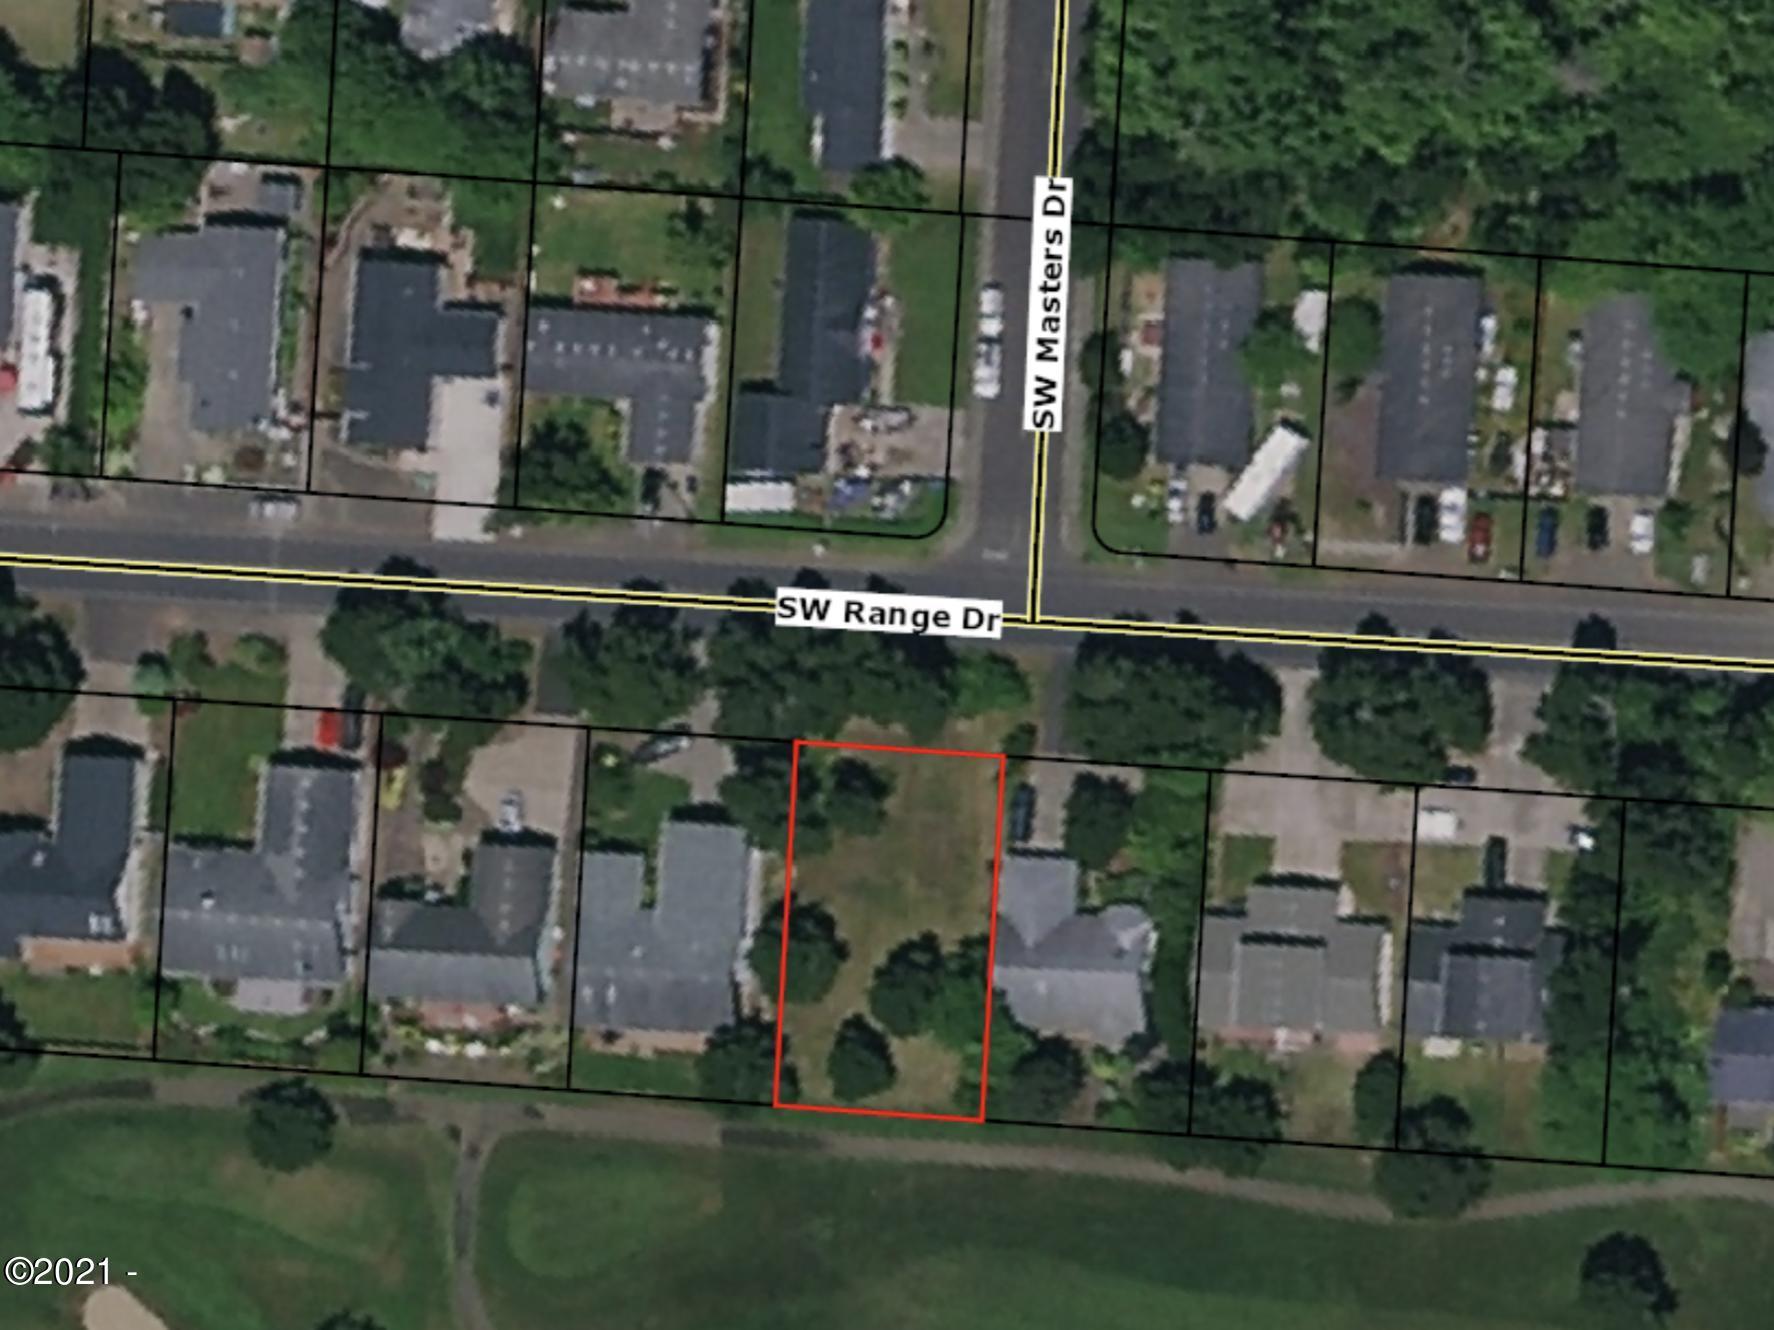 305 SW Range Dr, Waldport, OR 97394 - Golf Course Lot